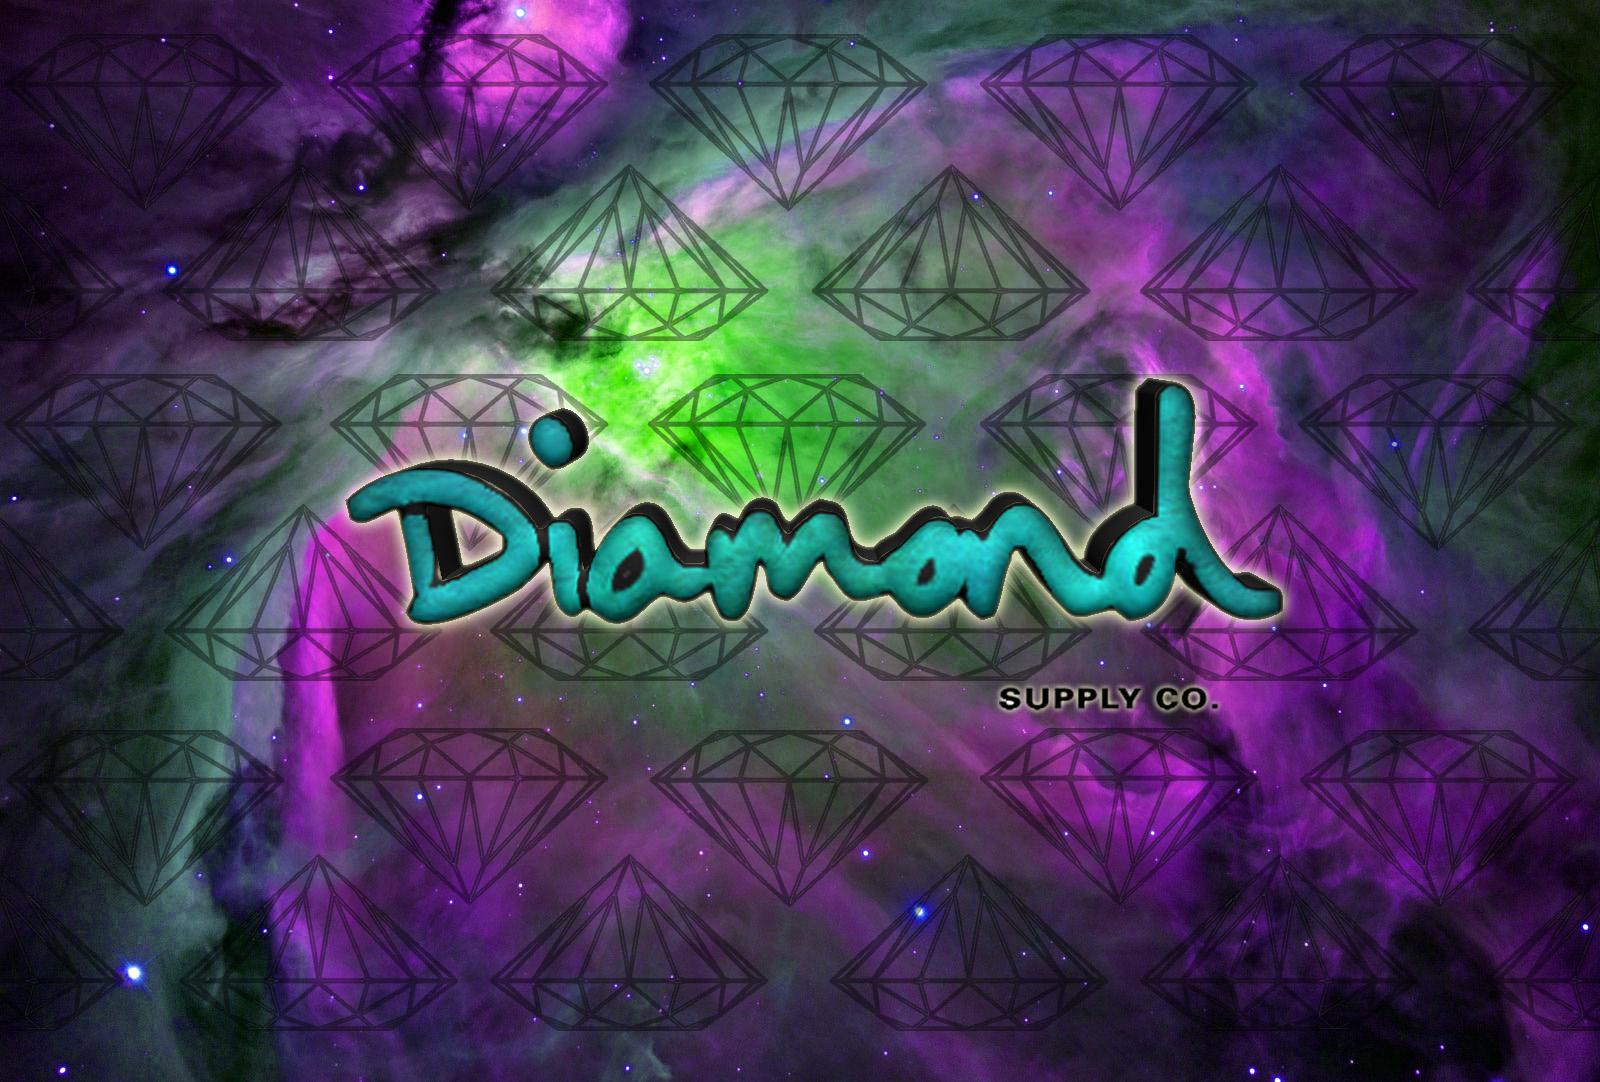 Diamond Supply Co Tumblr Backgrounds Custom diamond supply picture 1600x1082